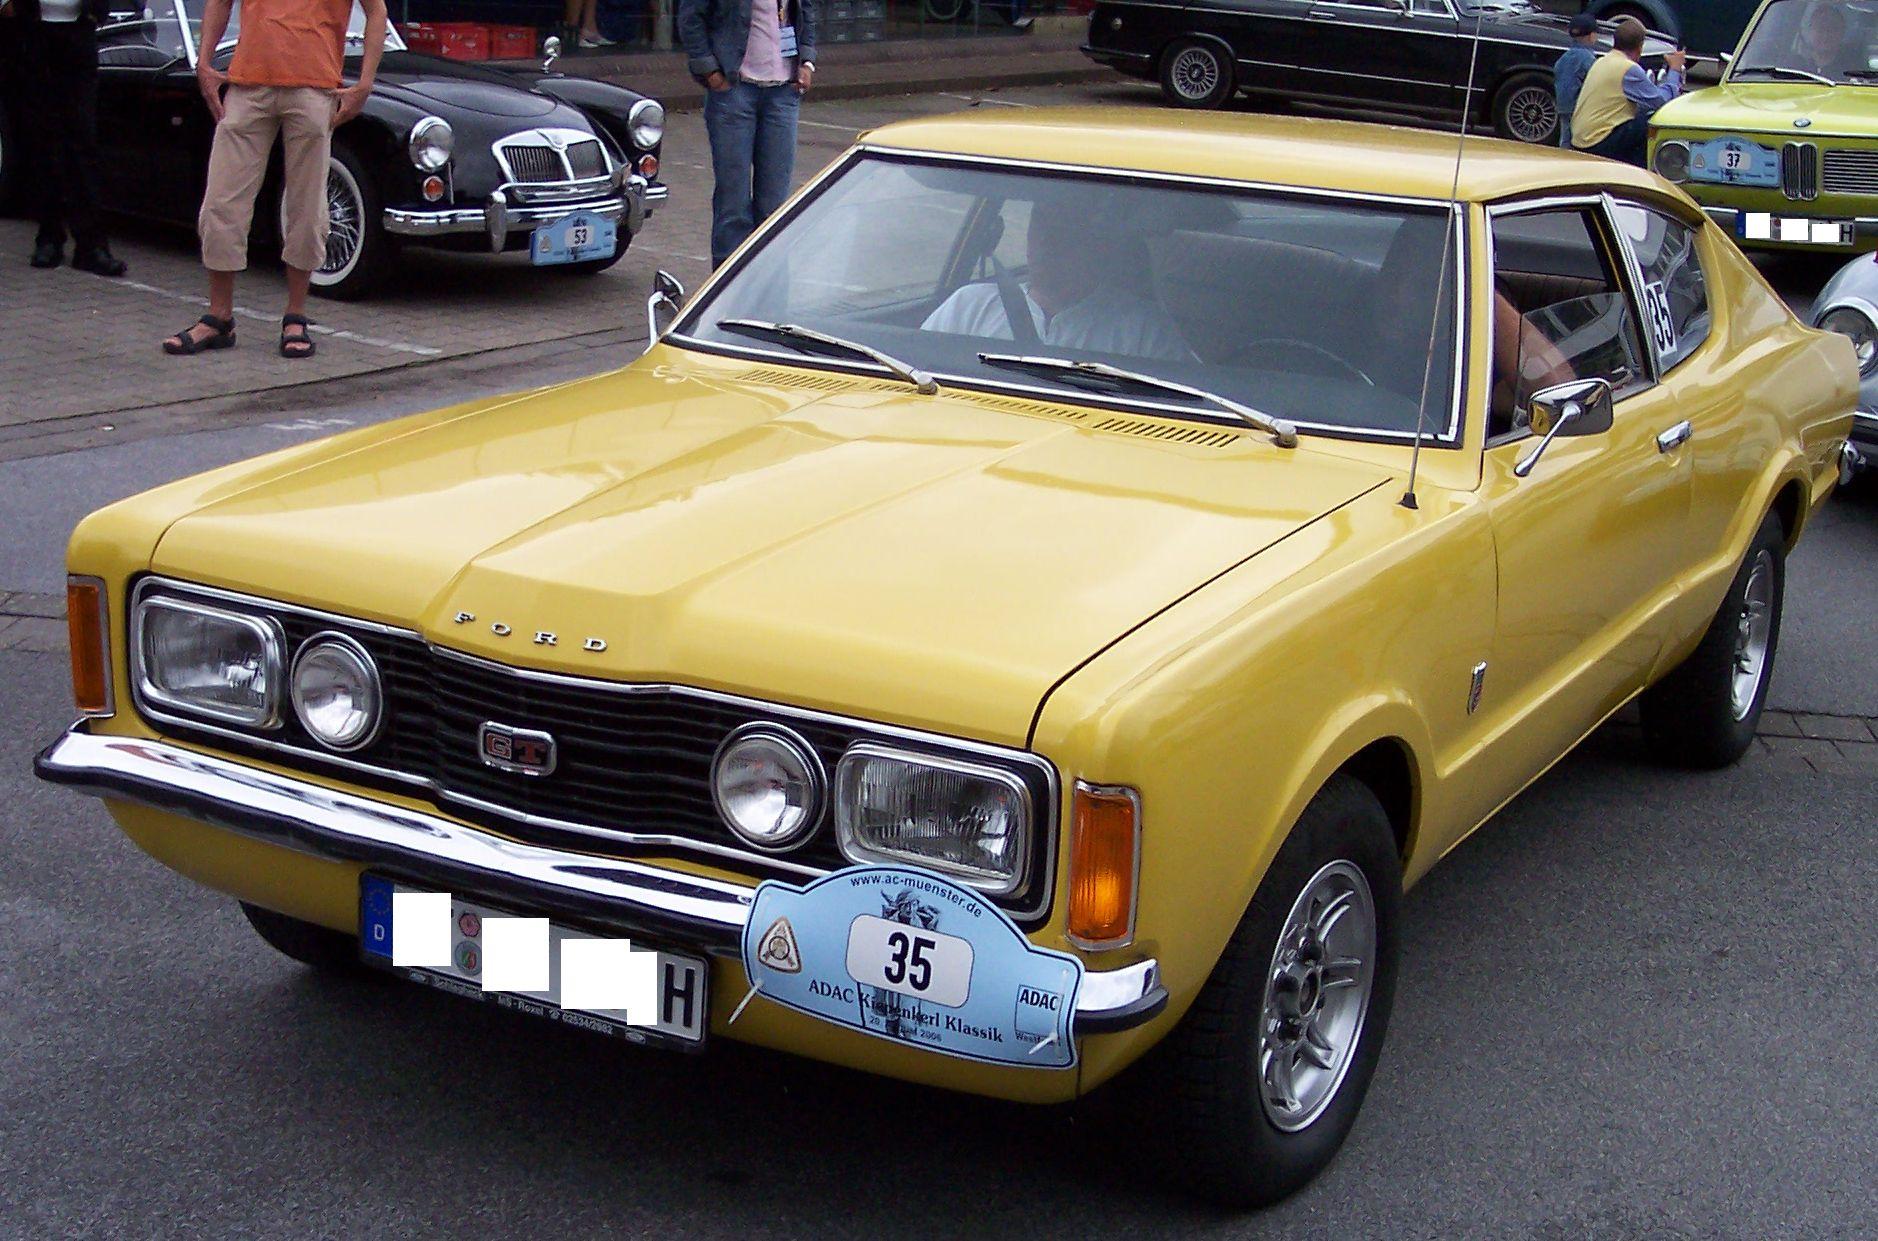 File Ford Taunus Coupe 2 0 1972 Yellow Vl2 Jpg Wikimedia